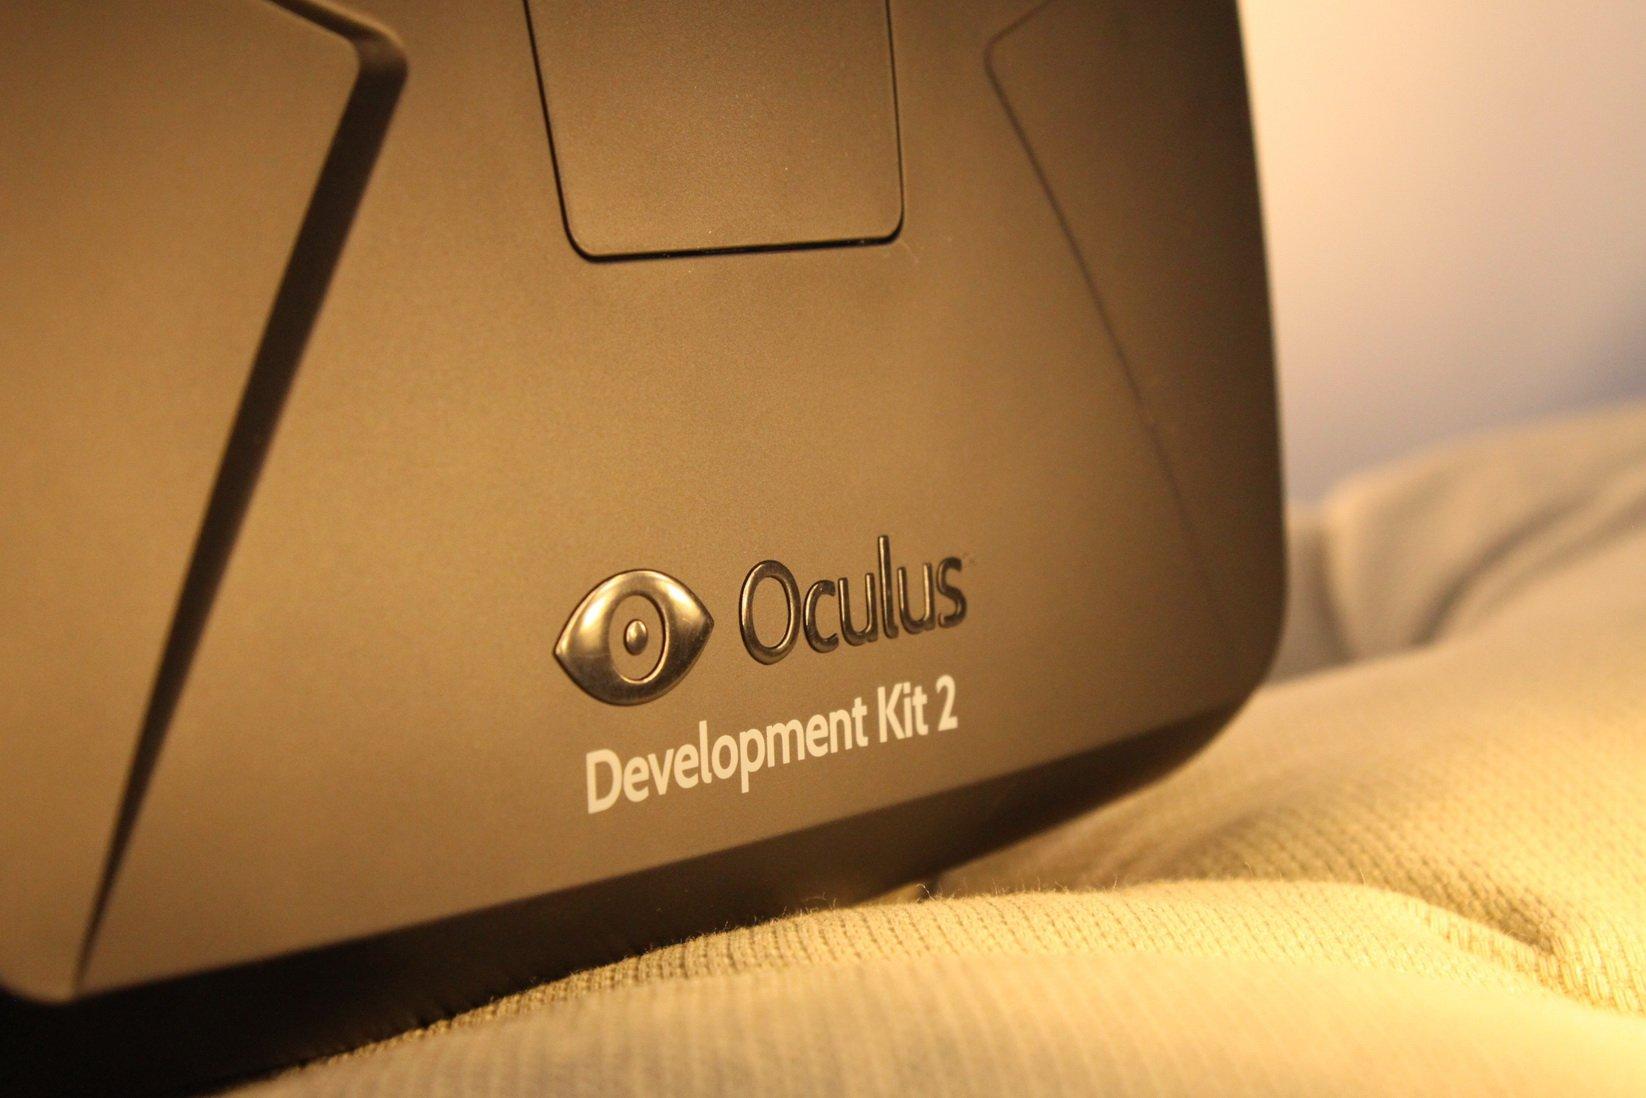 OculusRiftDK2 Gameblog 235